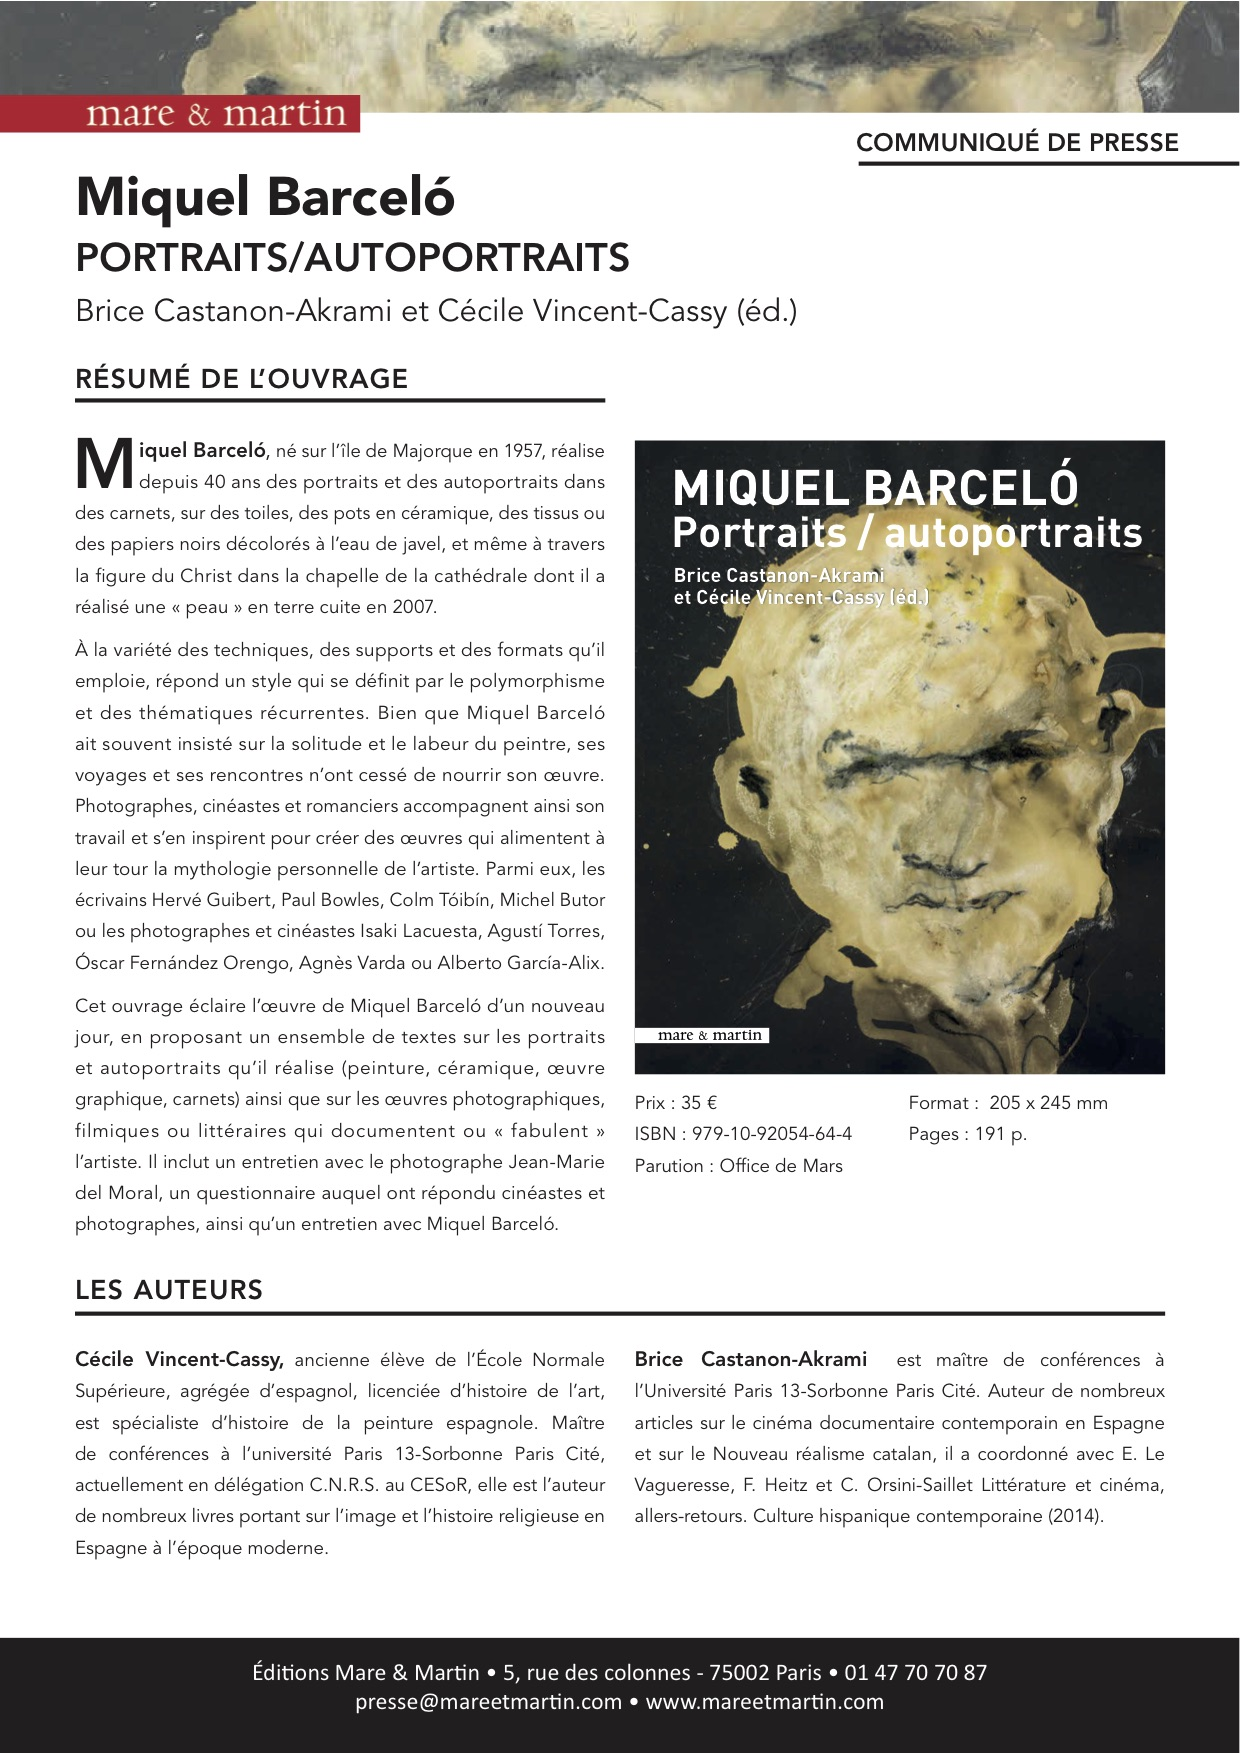 CP-Miquel Barcelo 1